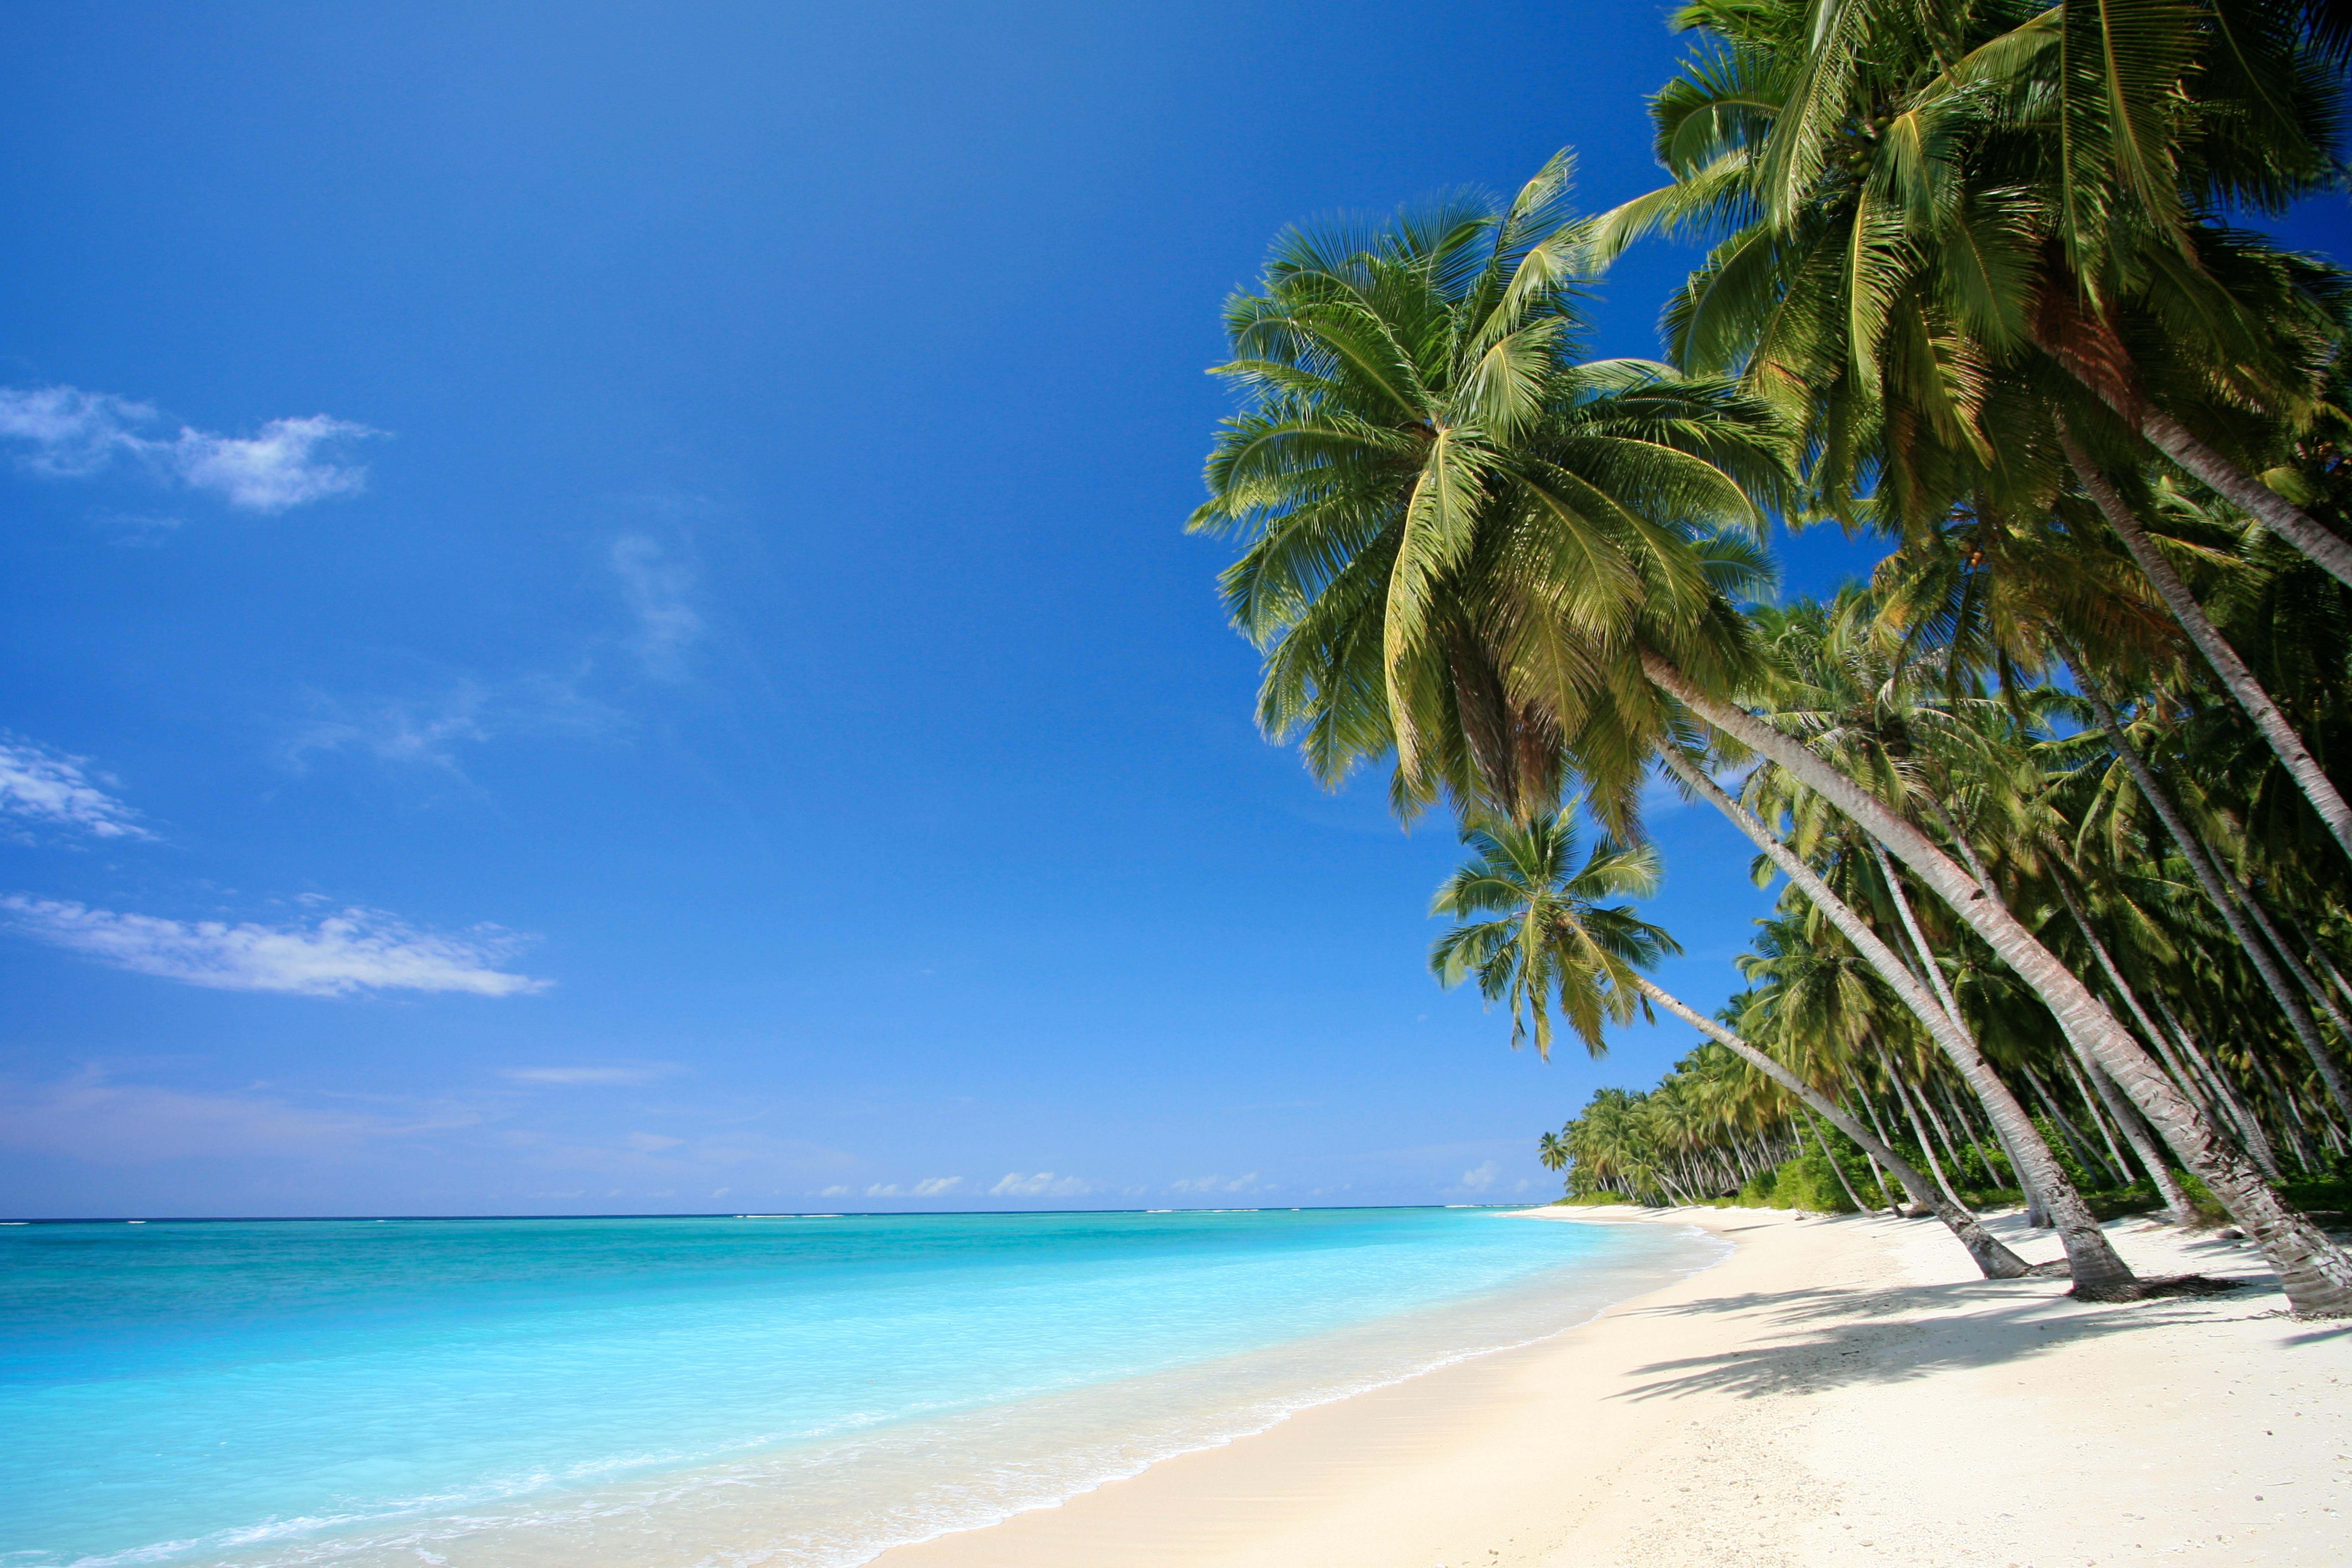 Beach Screensaver wallpaper Tropical Beach Screensaver hd wallpaper 7512x5008